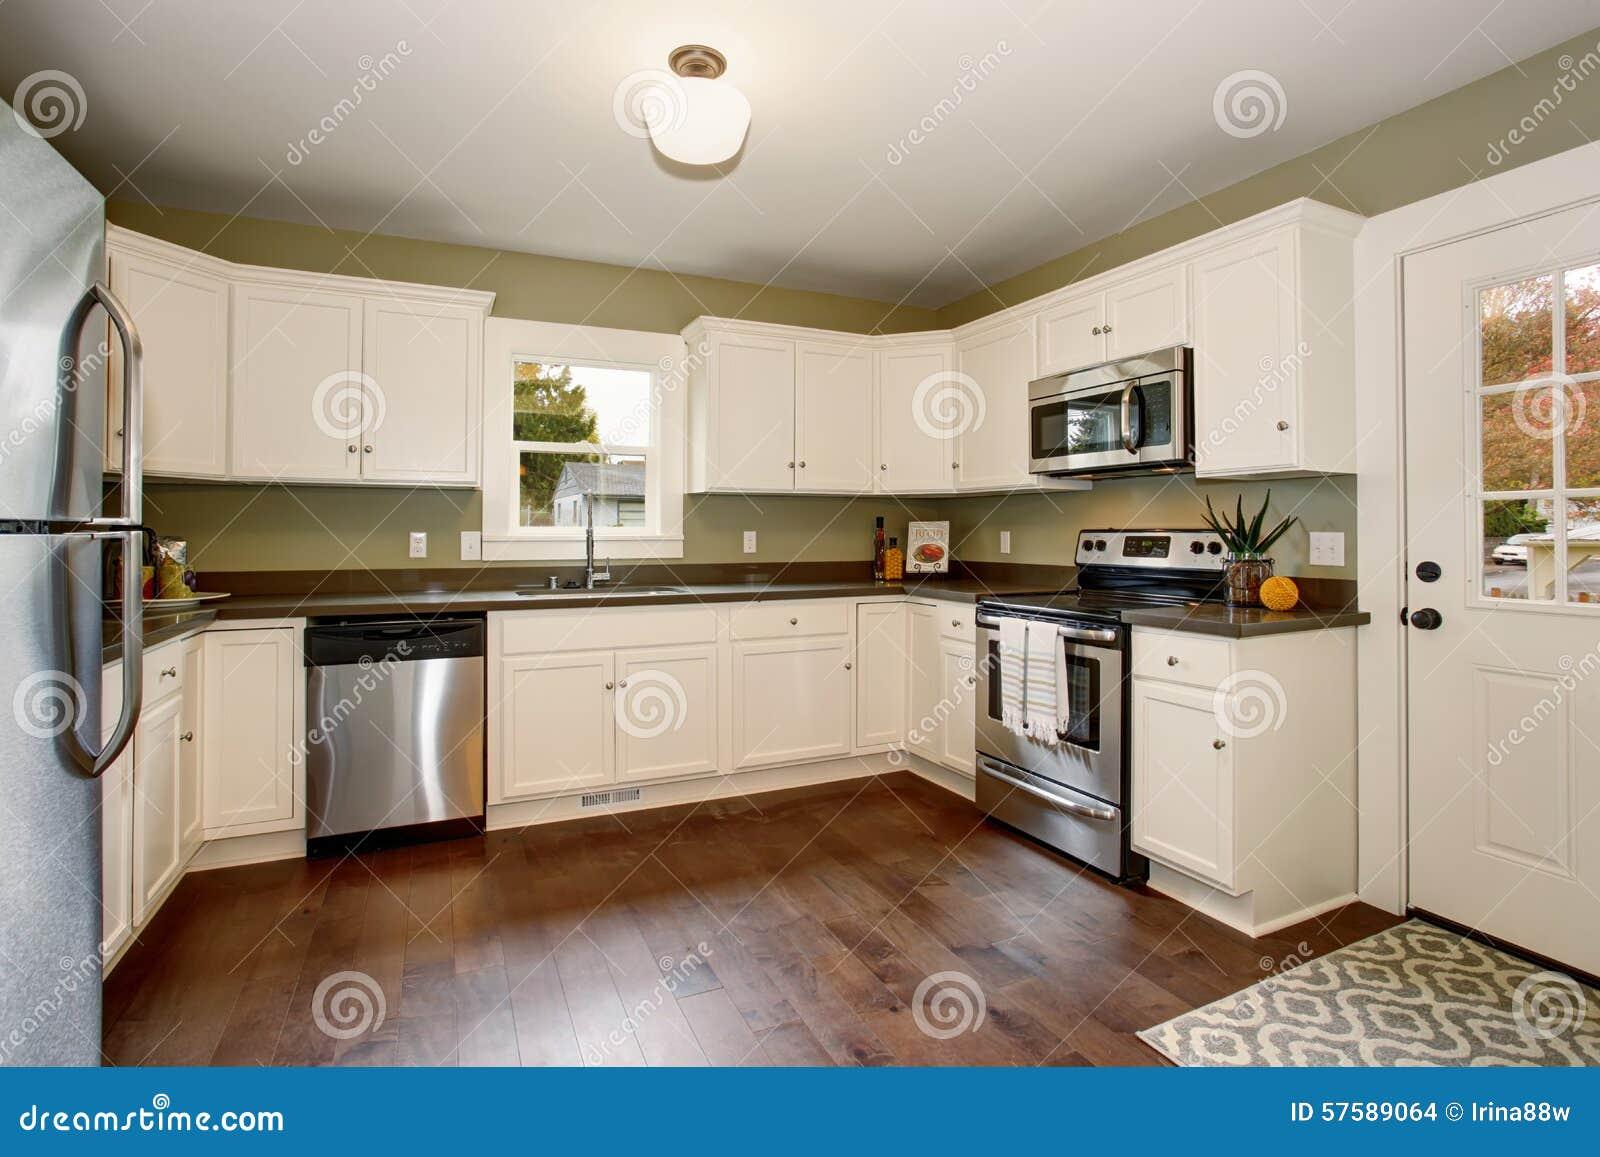 Klassieke keuken met groene binnenlandse verf, en witte kabinetten ...